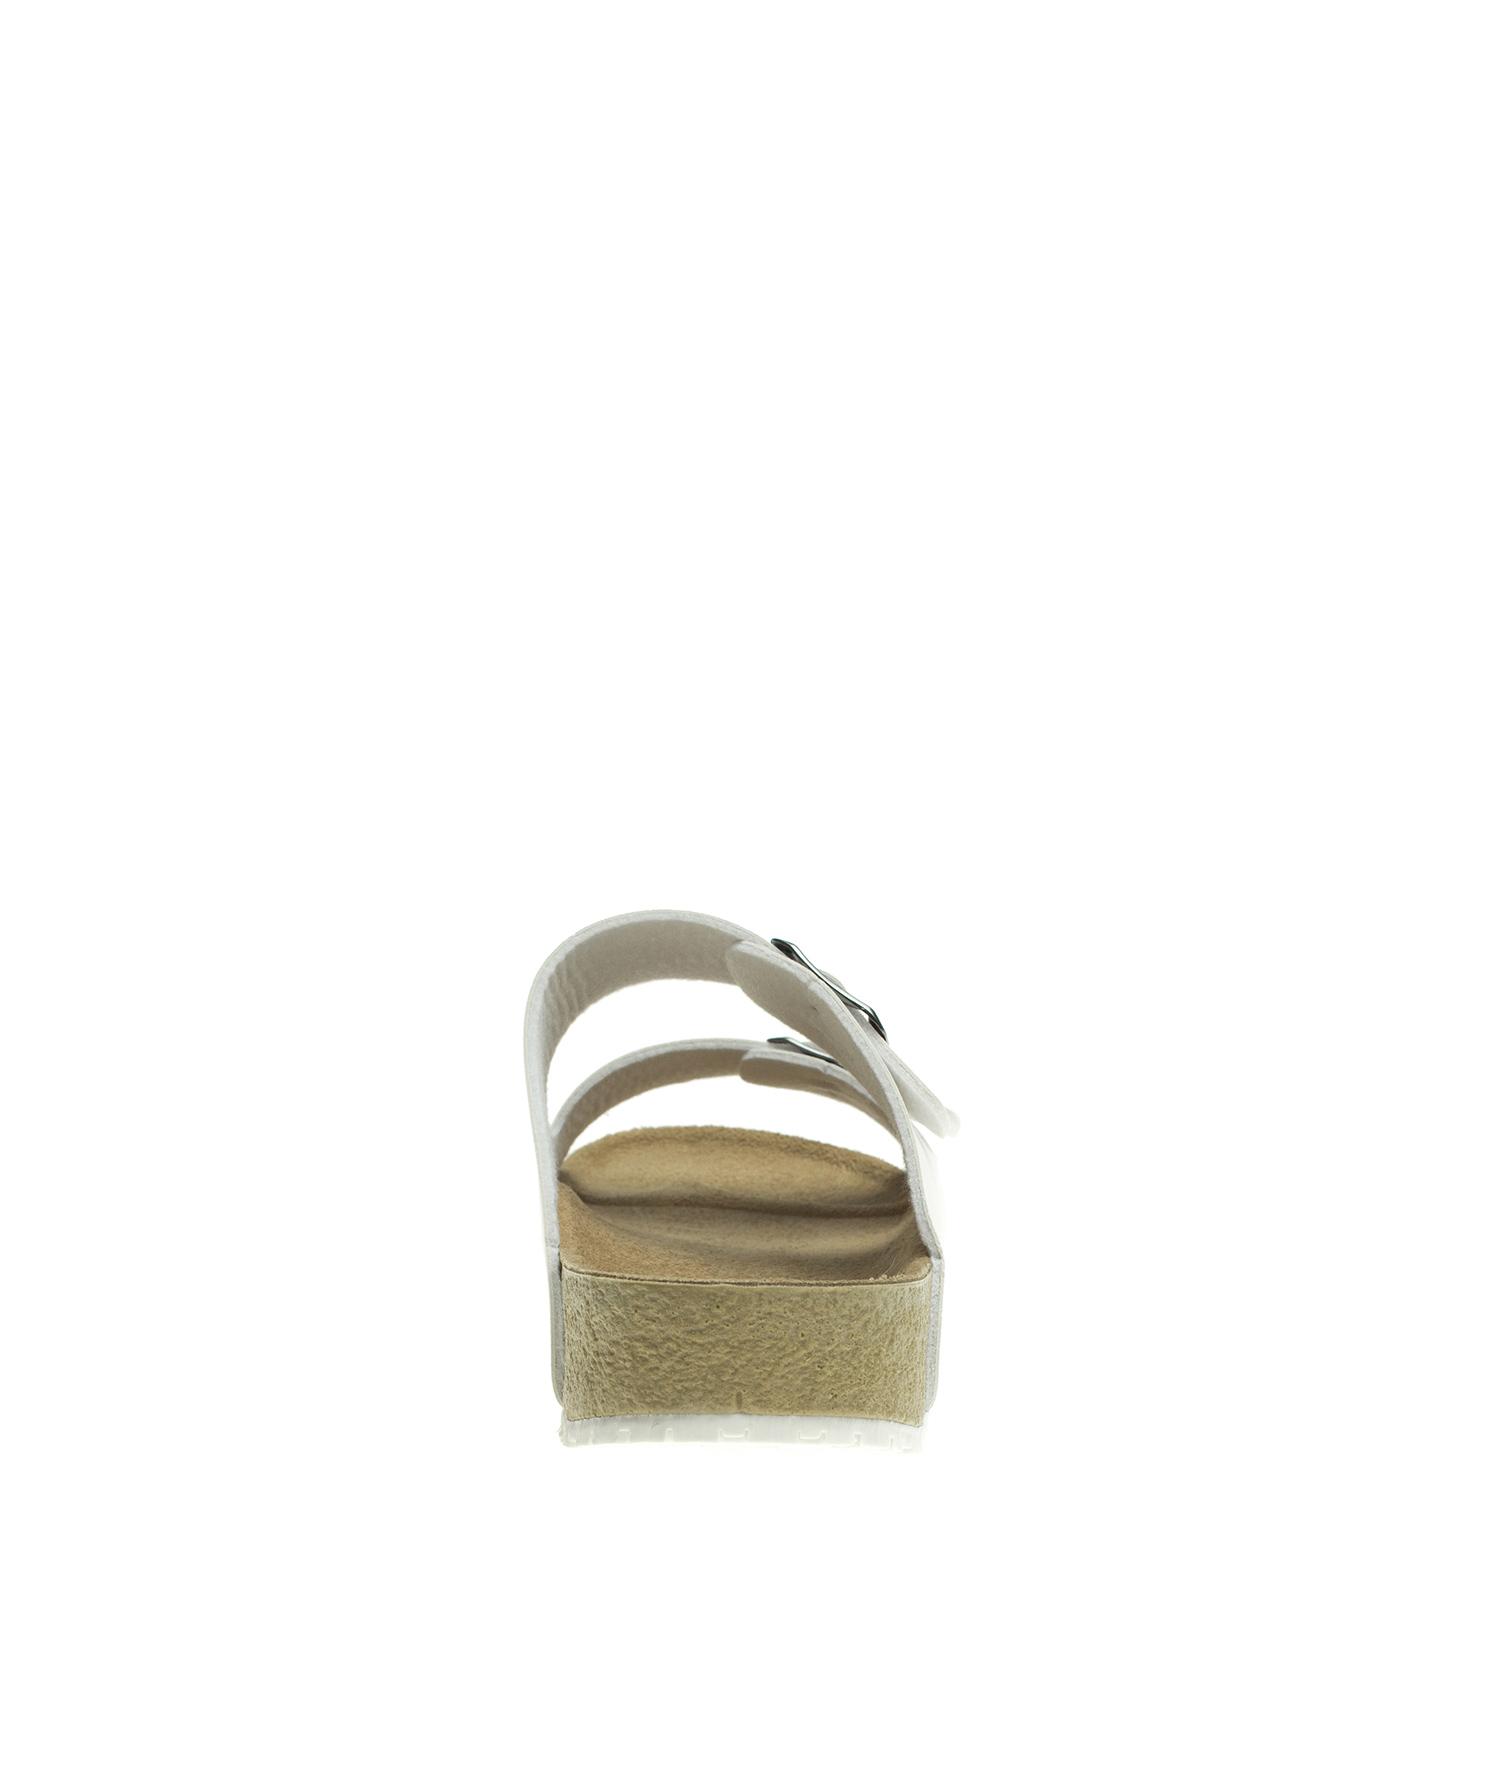 b68a3b0567bf9 AnnaKastle Womens Double Strap Silde Flat Sandals White